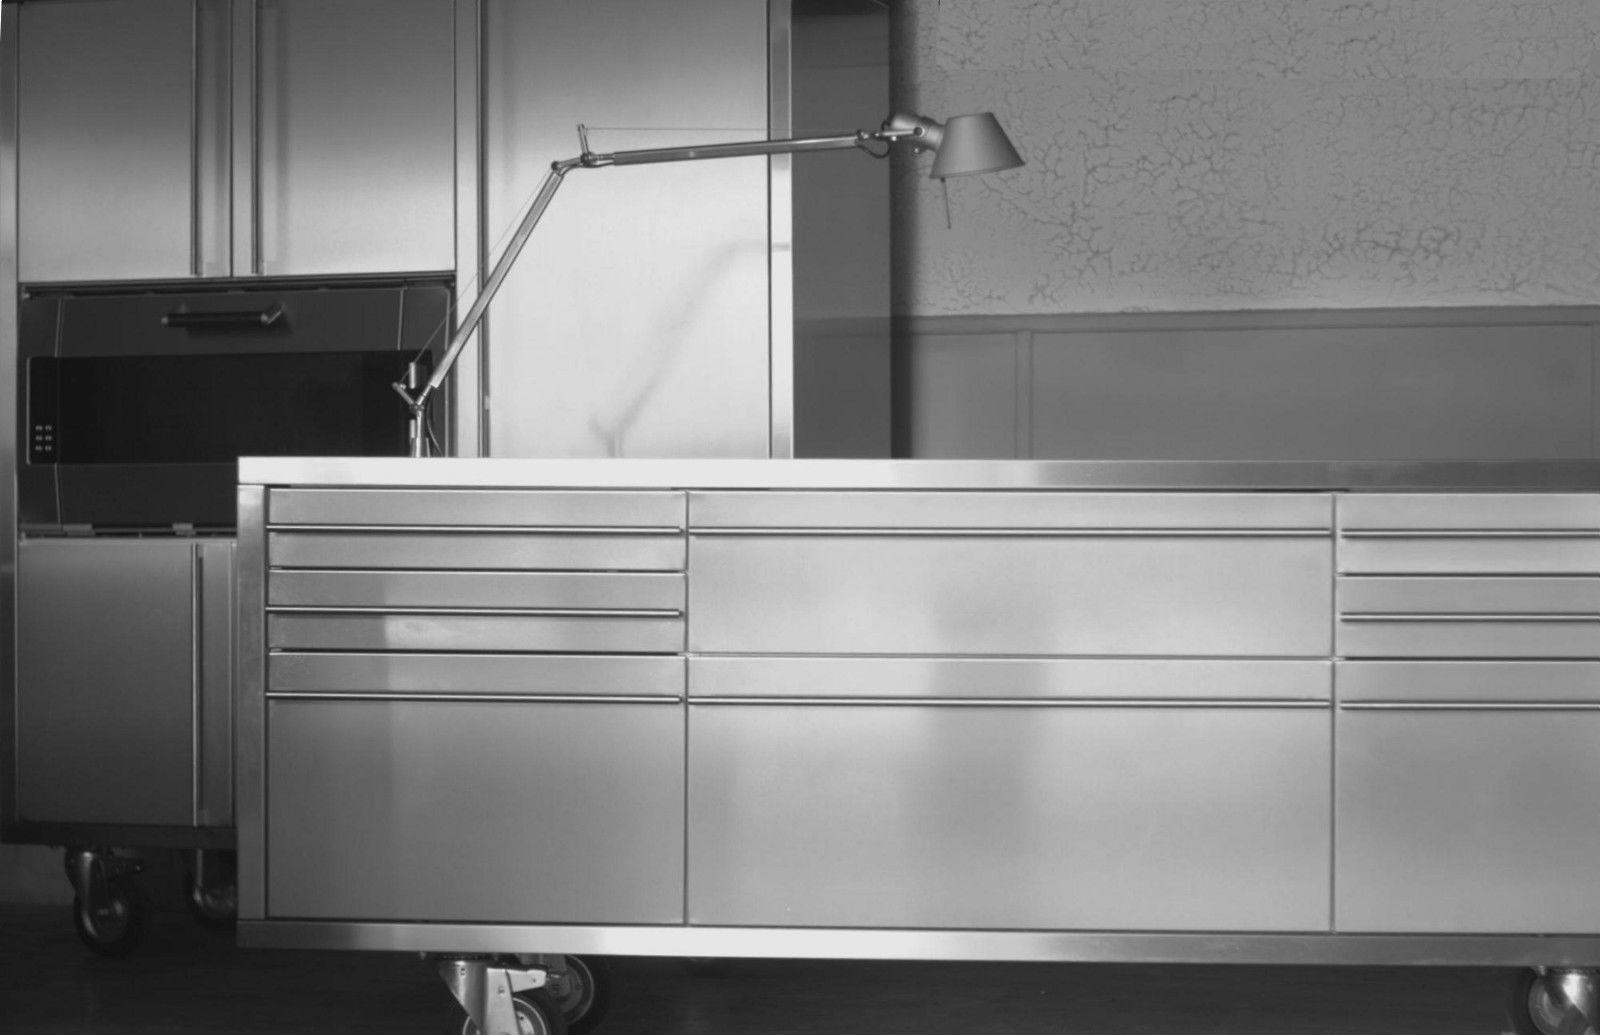 Küchenmodule küchenmodule bulthaup system 20 edelstahl gaggenau miele